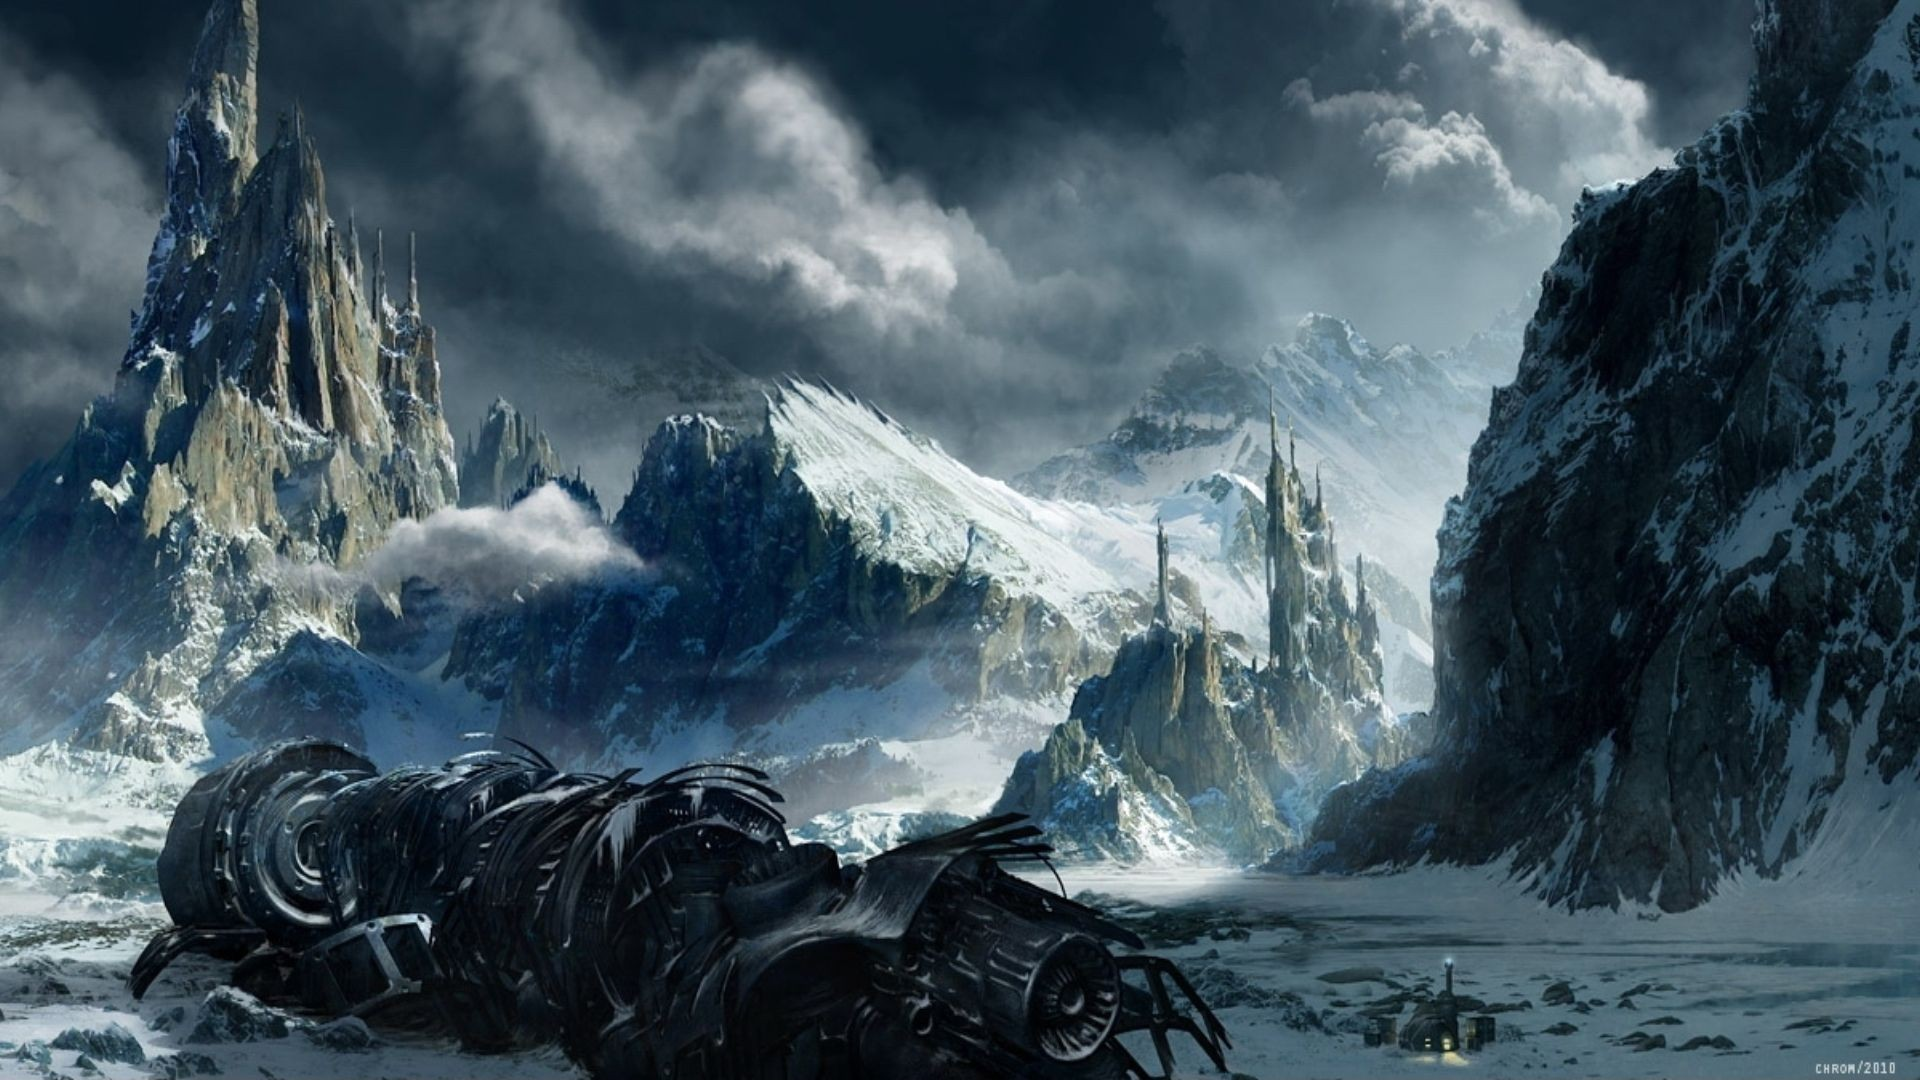 Sci-Fi Landscape Wallpaper | fantasy landscapes wallpapers images wallpaper  1920×1080